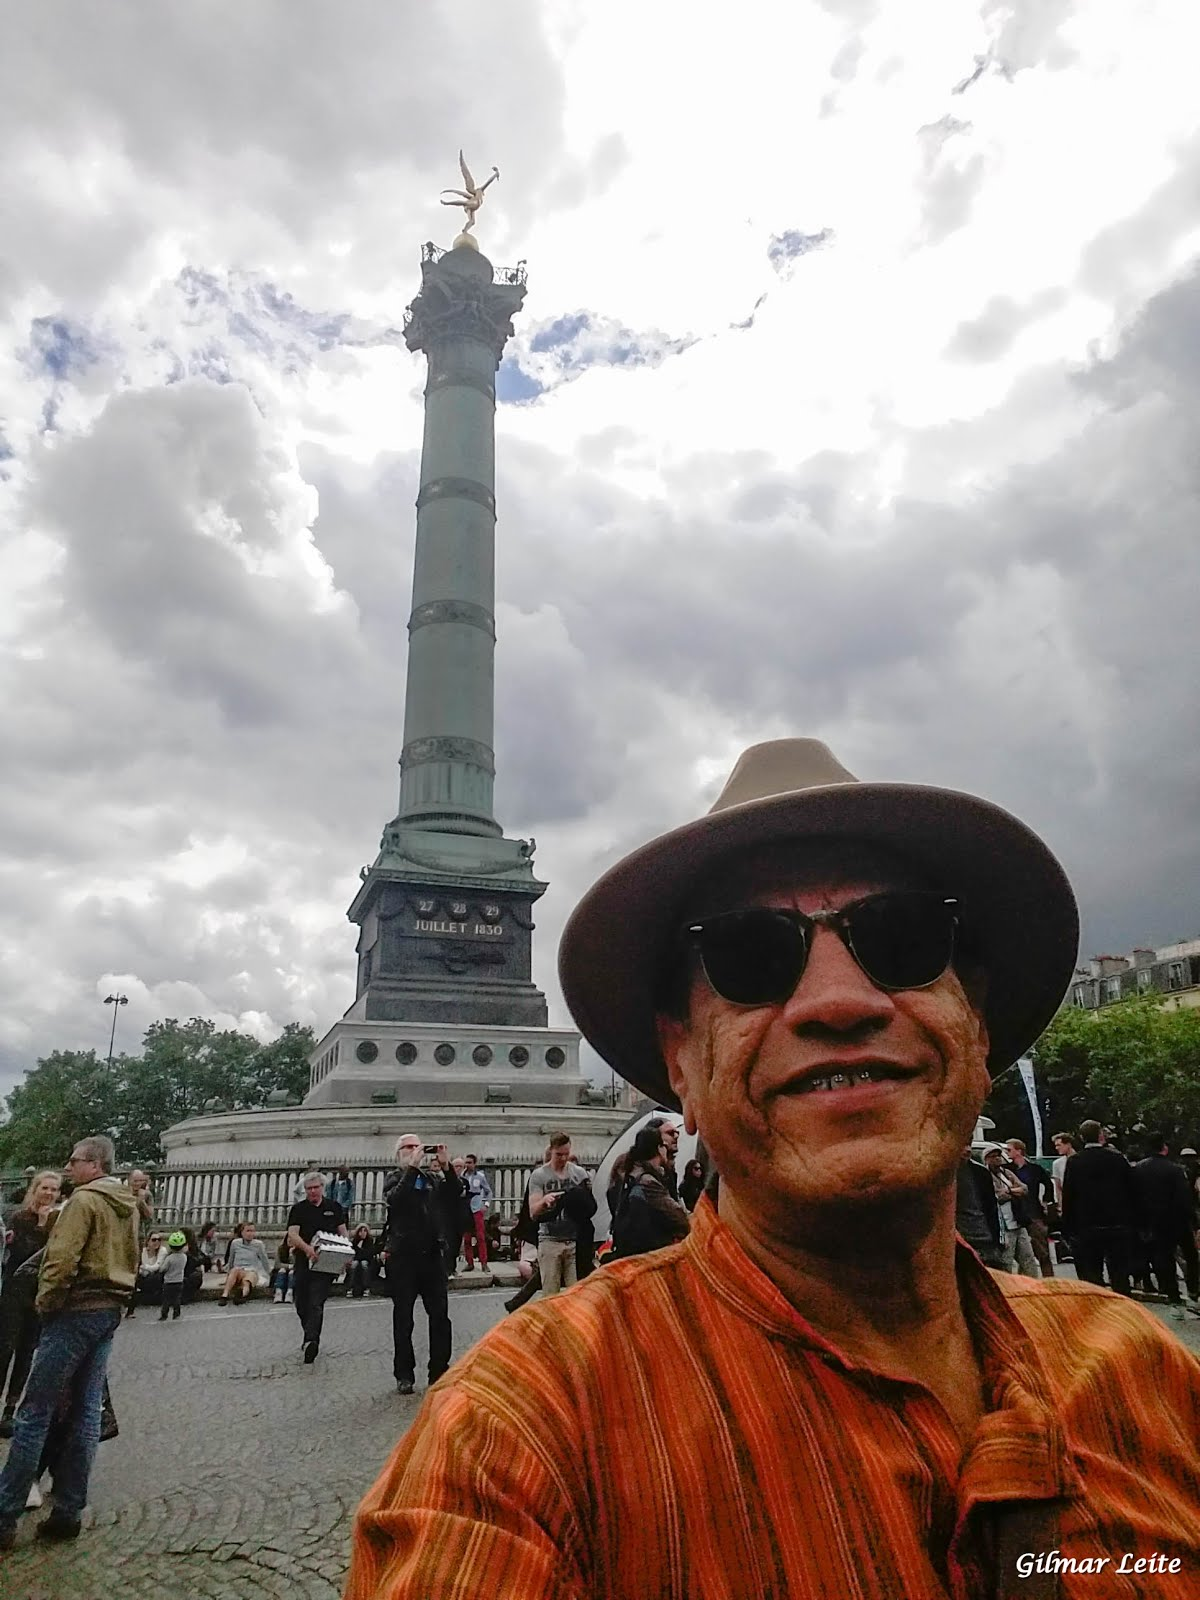 TORRE DA BASTILHA - PARIS